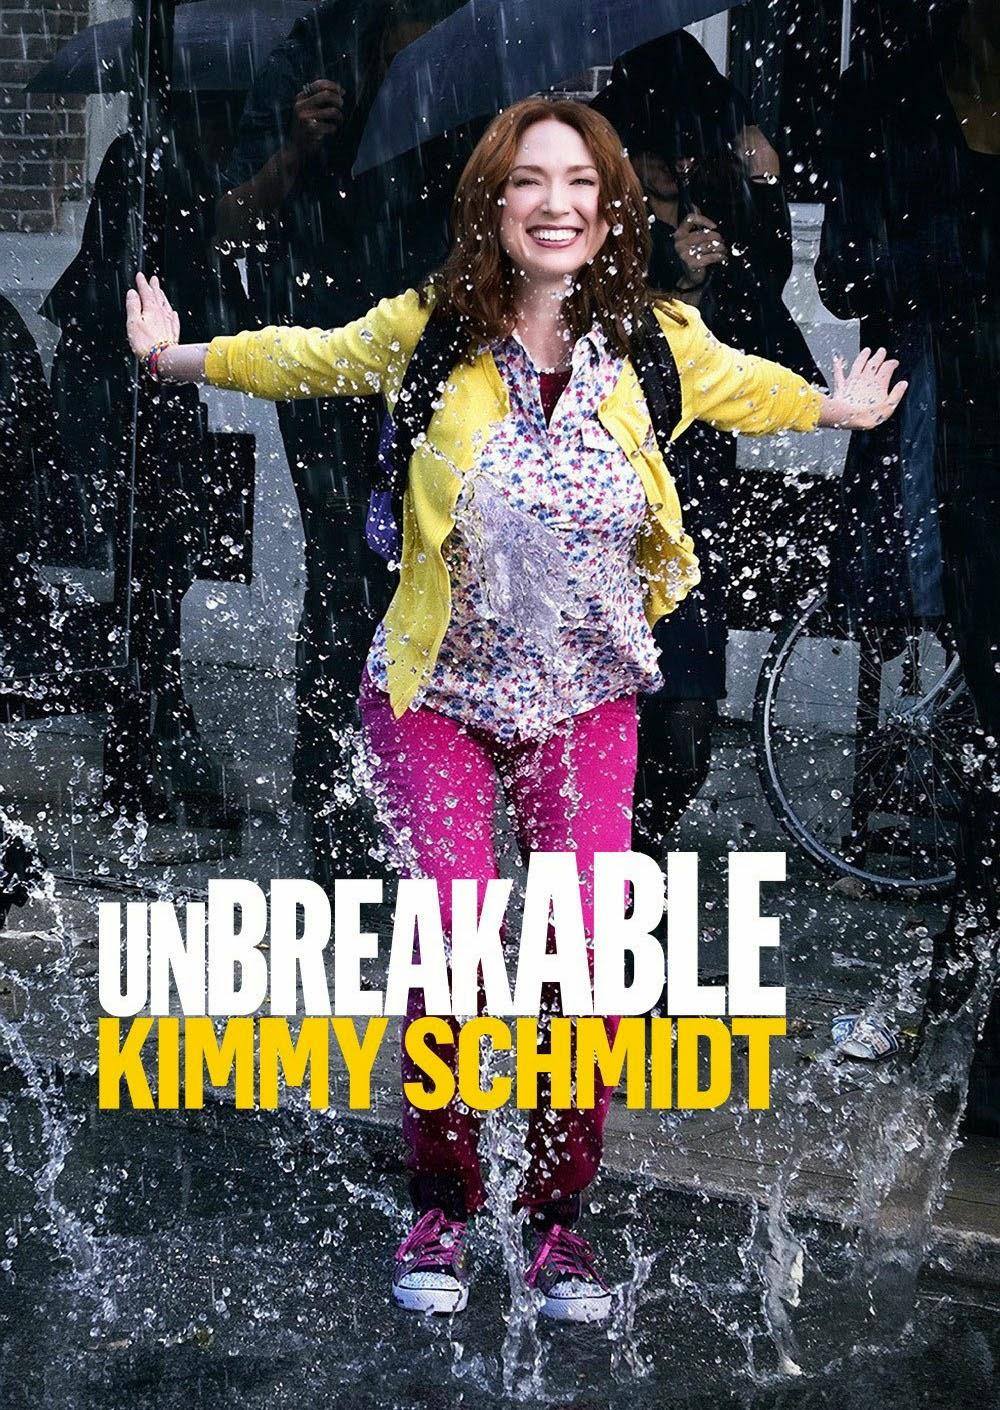 unbreakable-kimmy-schmidt-first-season.35001